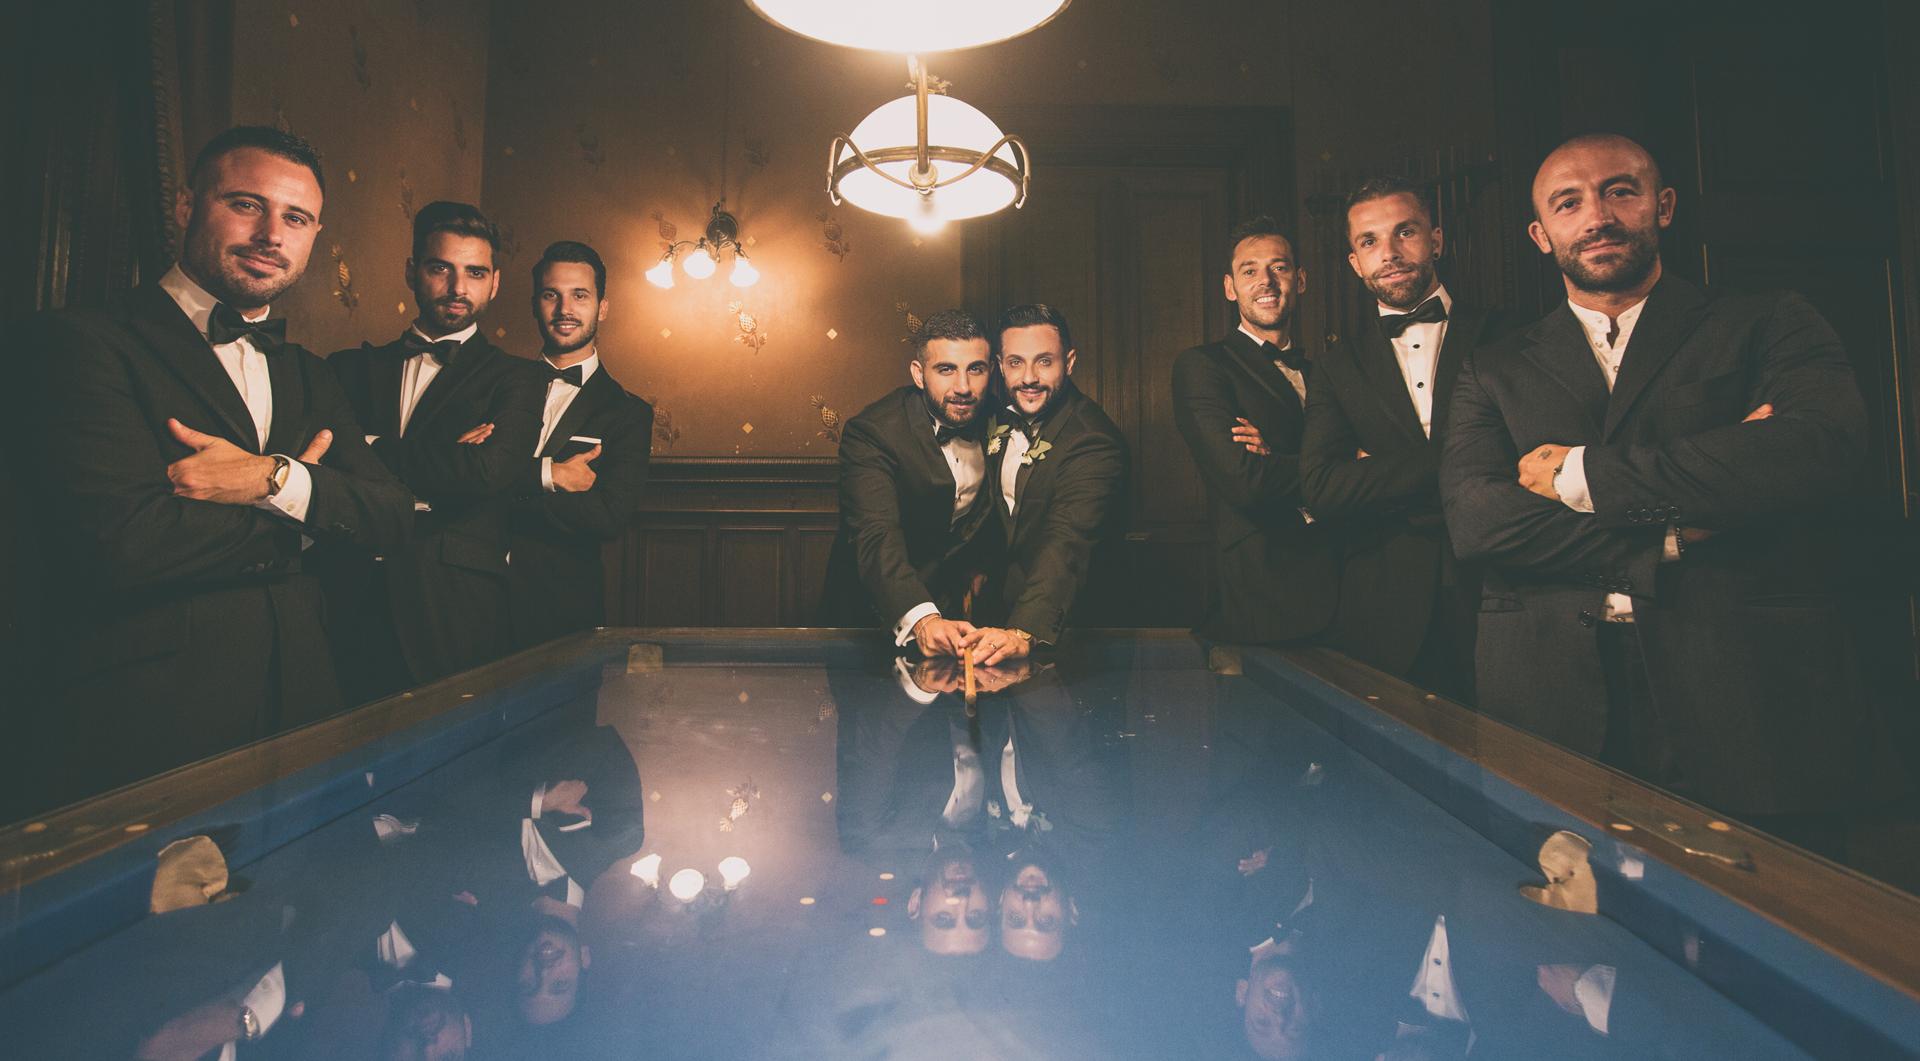 matrimonio chic catania gay palazzo manganelli vittorio maltese storyshooting fotografo top